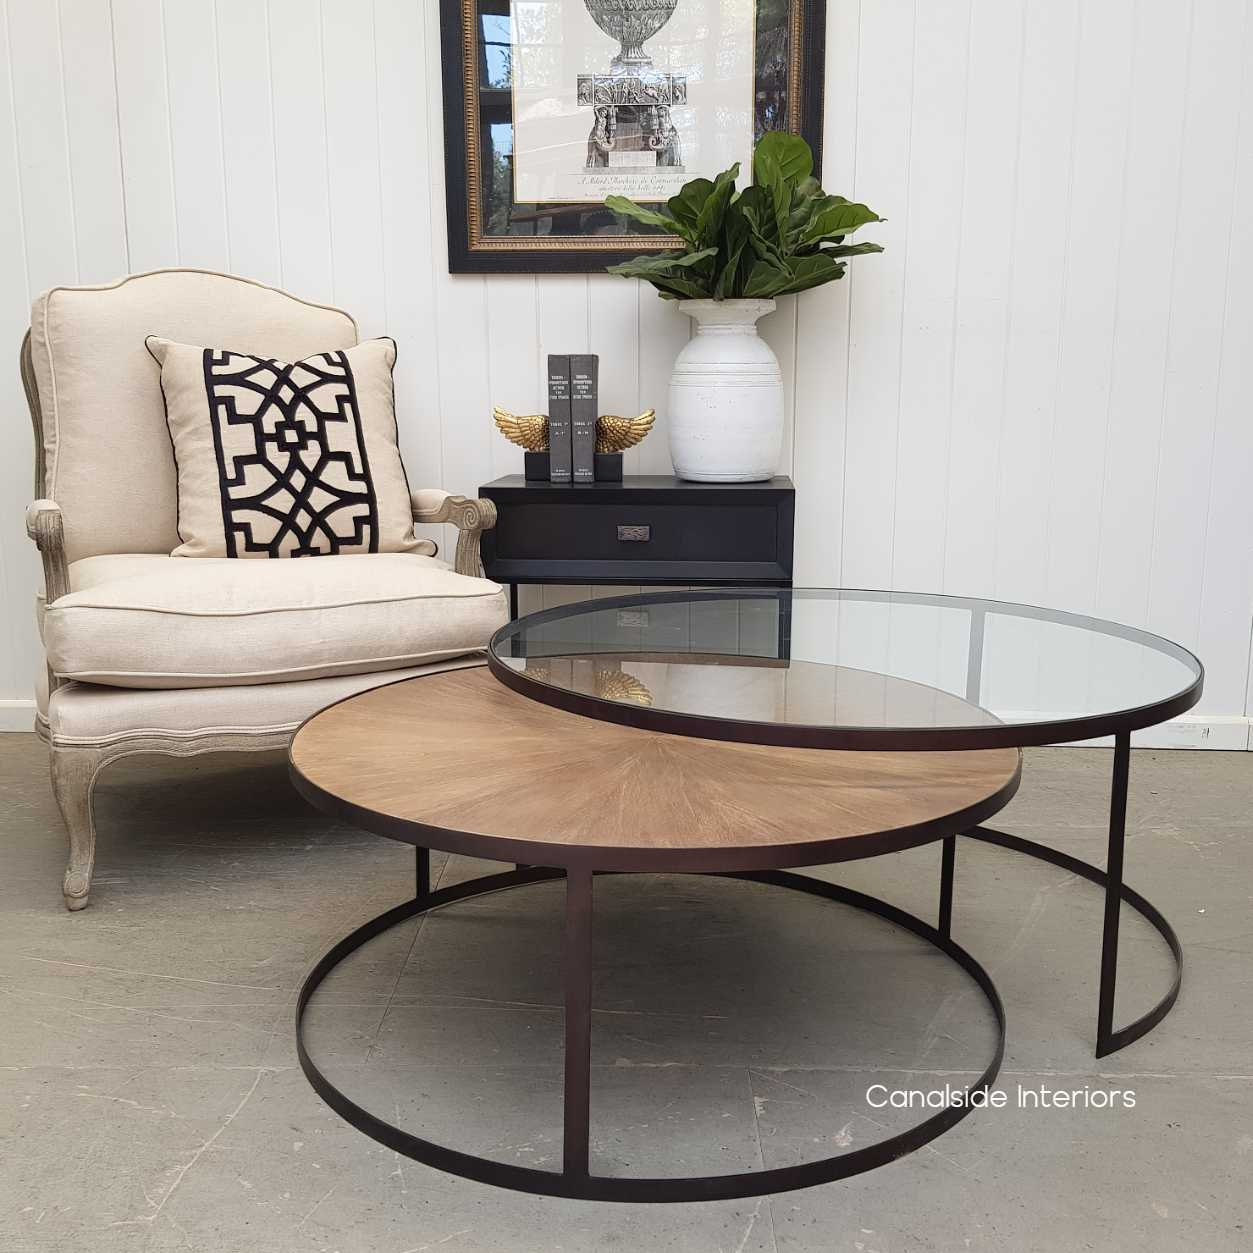 - Bermuda Plantation Nesting Coffee Table - Canalside Interiors